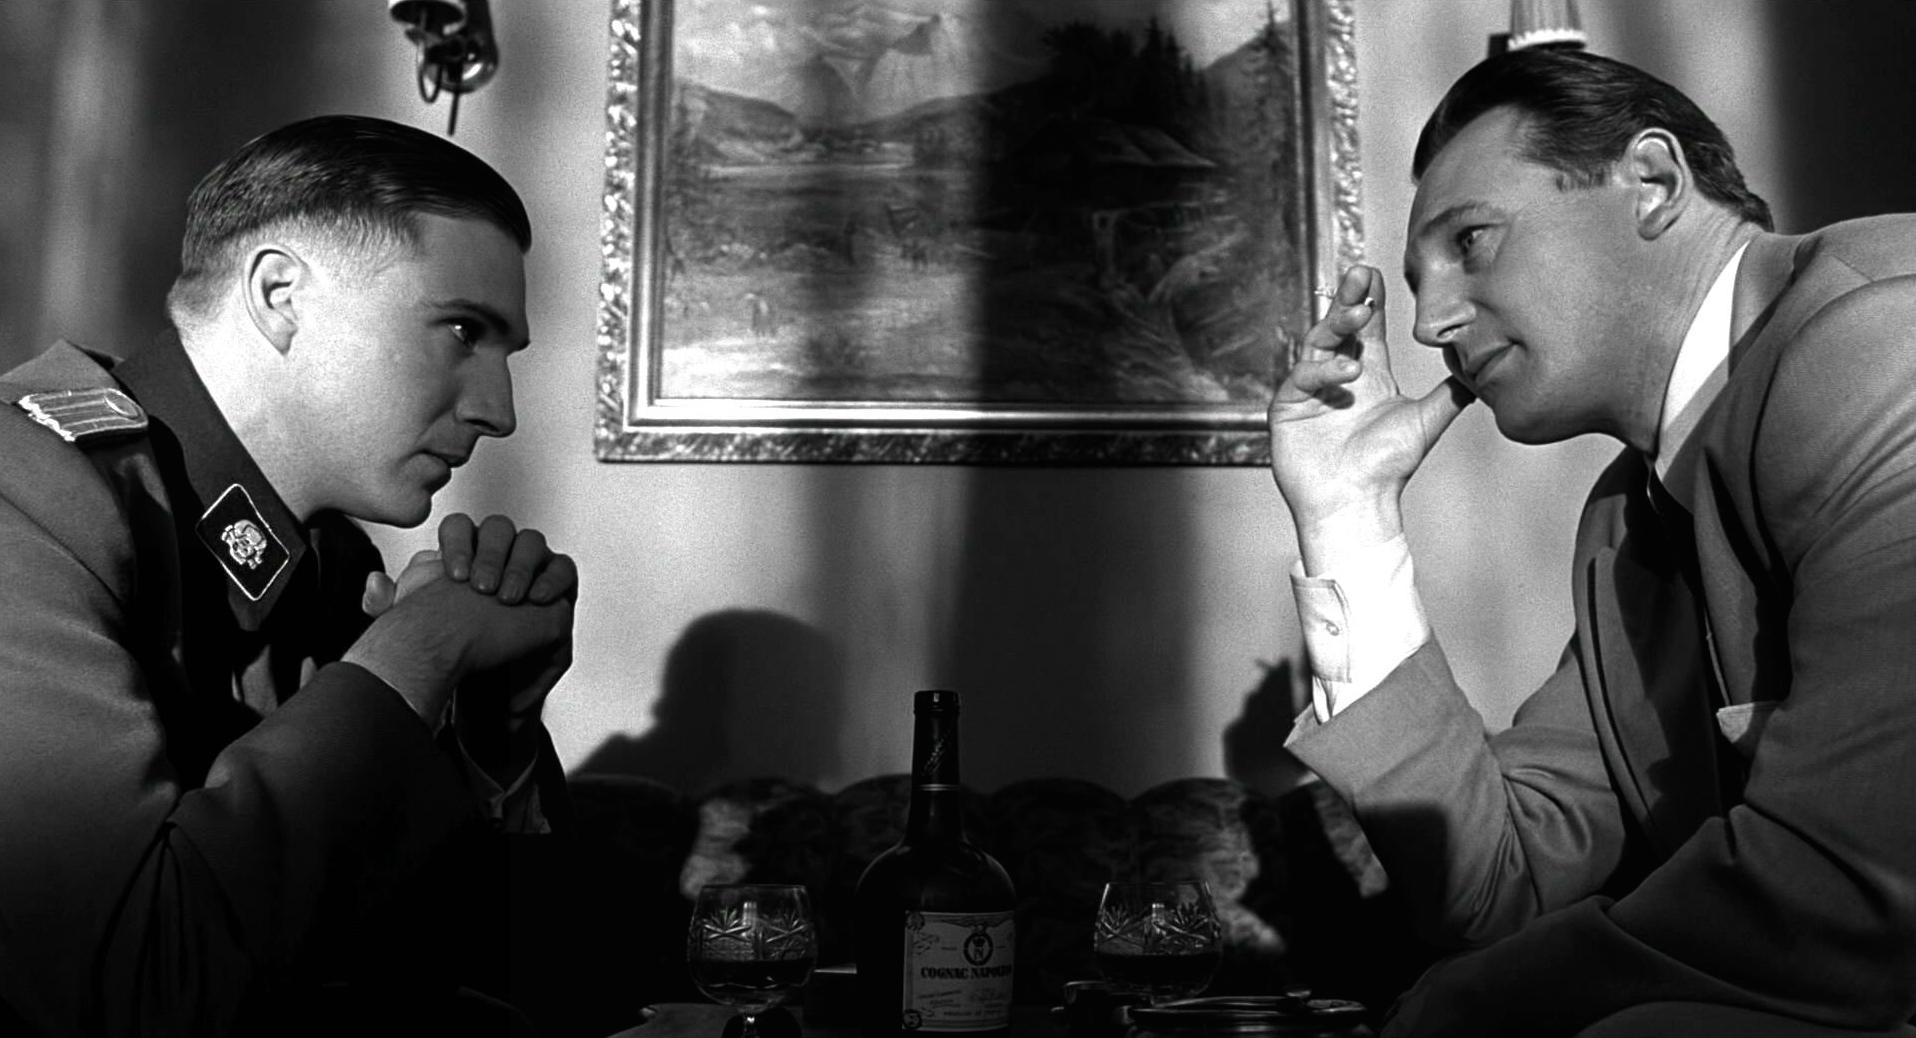 world war II movies based on true stories